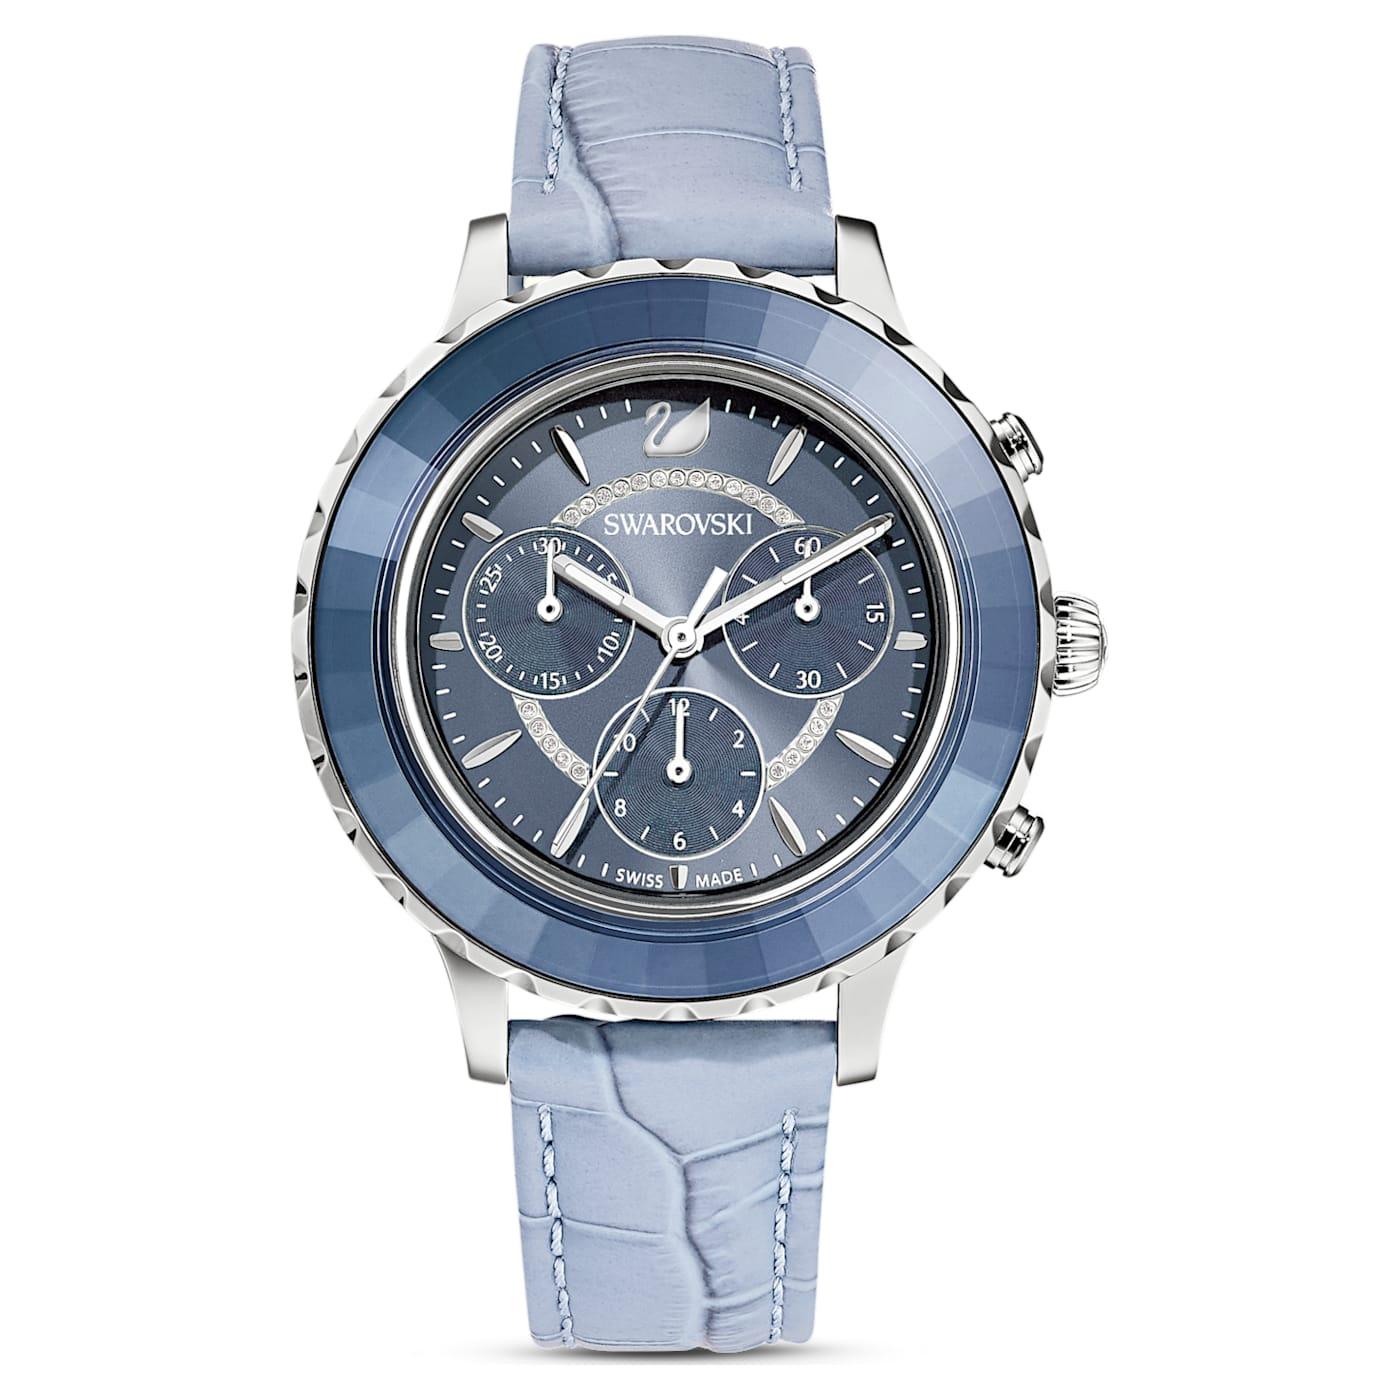 Montre Octea Lux Chrono bracelet en cuir, Bleu, Acier inoxydable, Swarovski